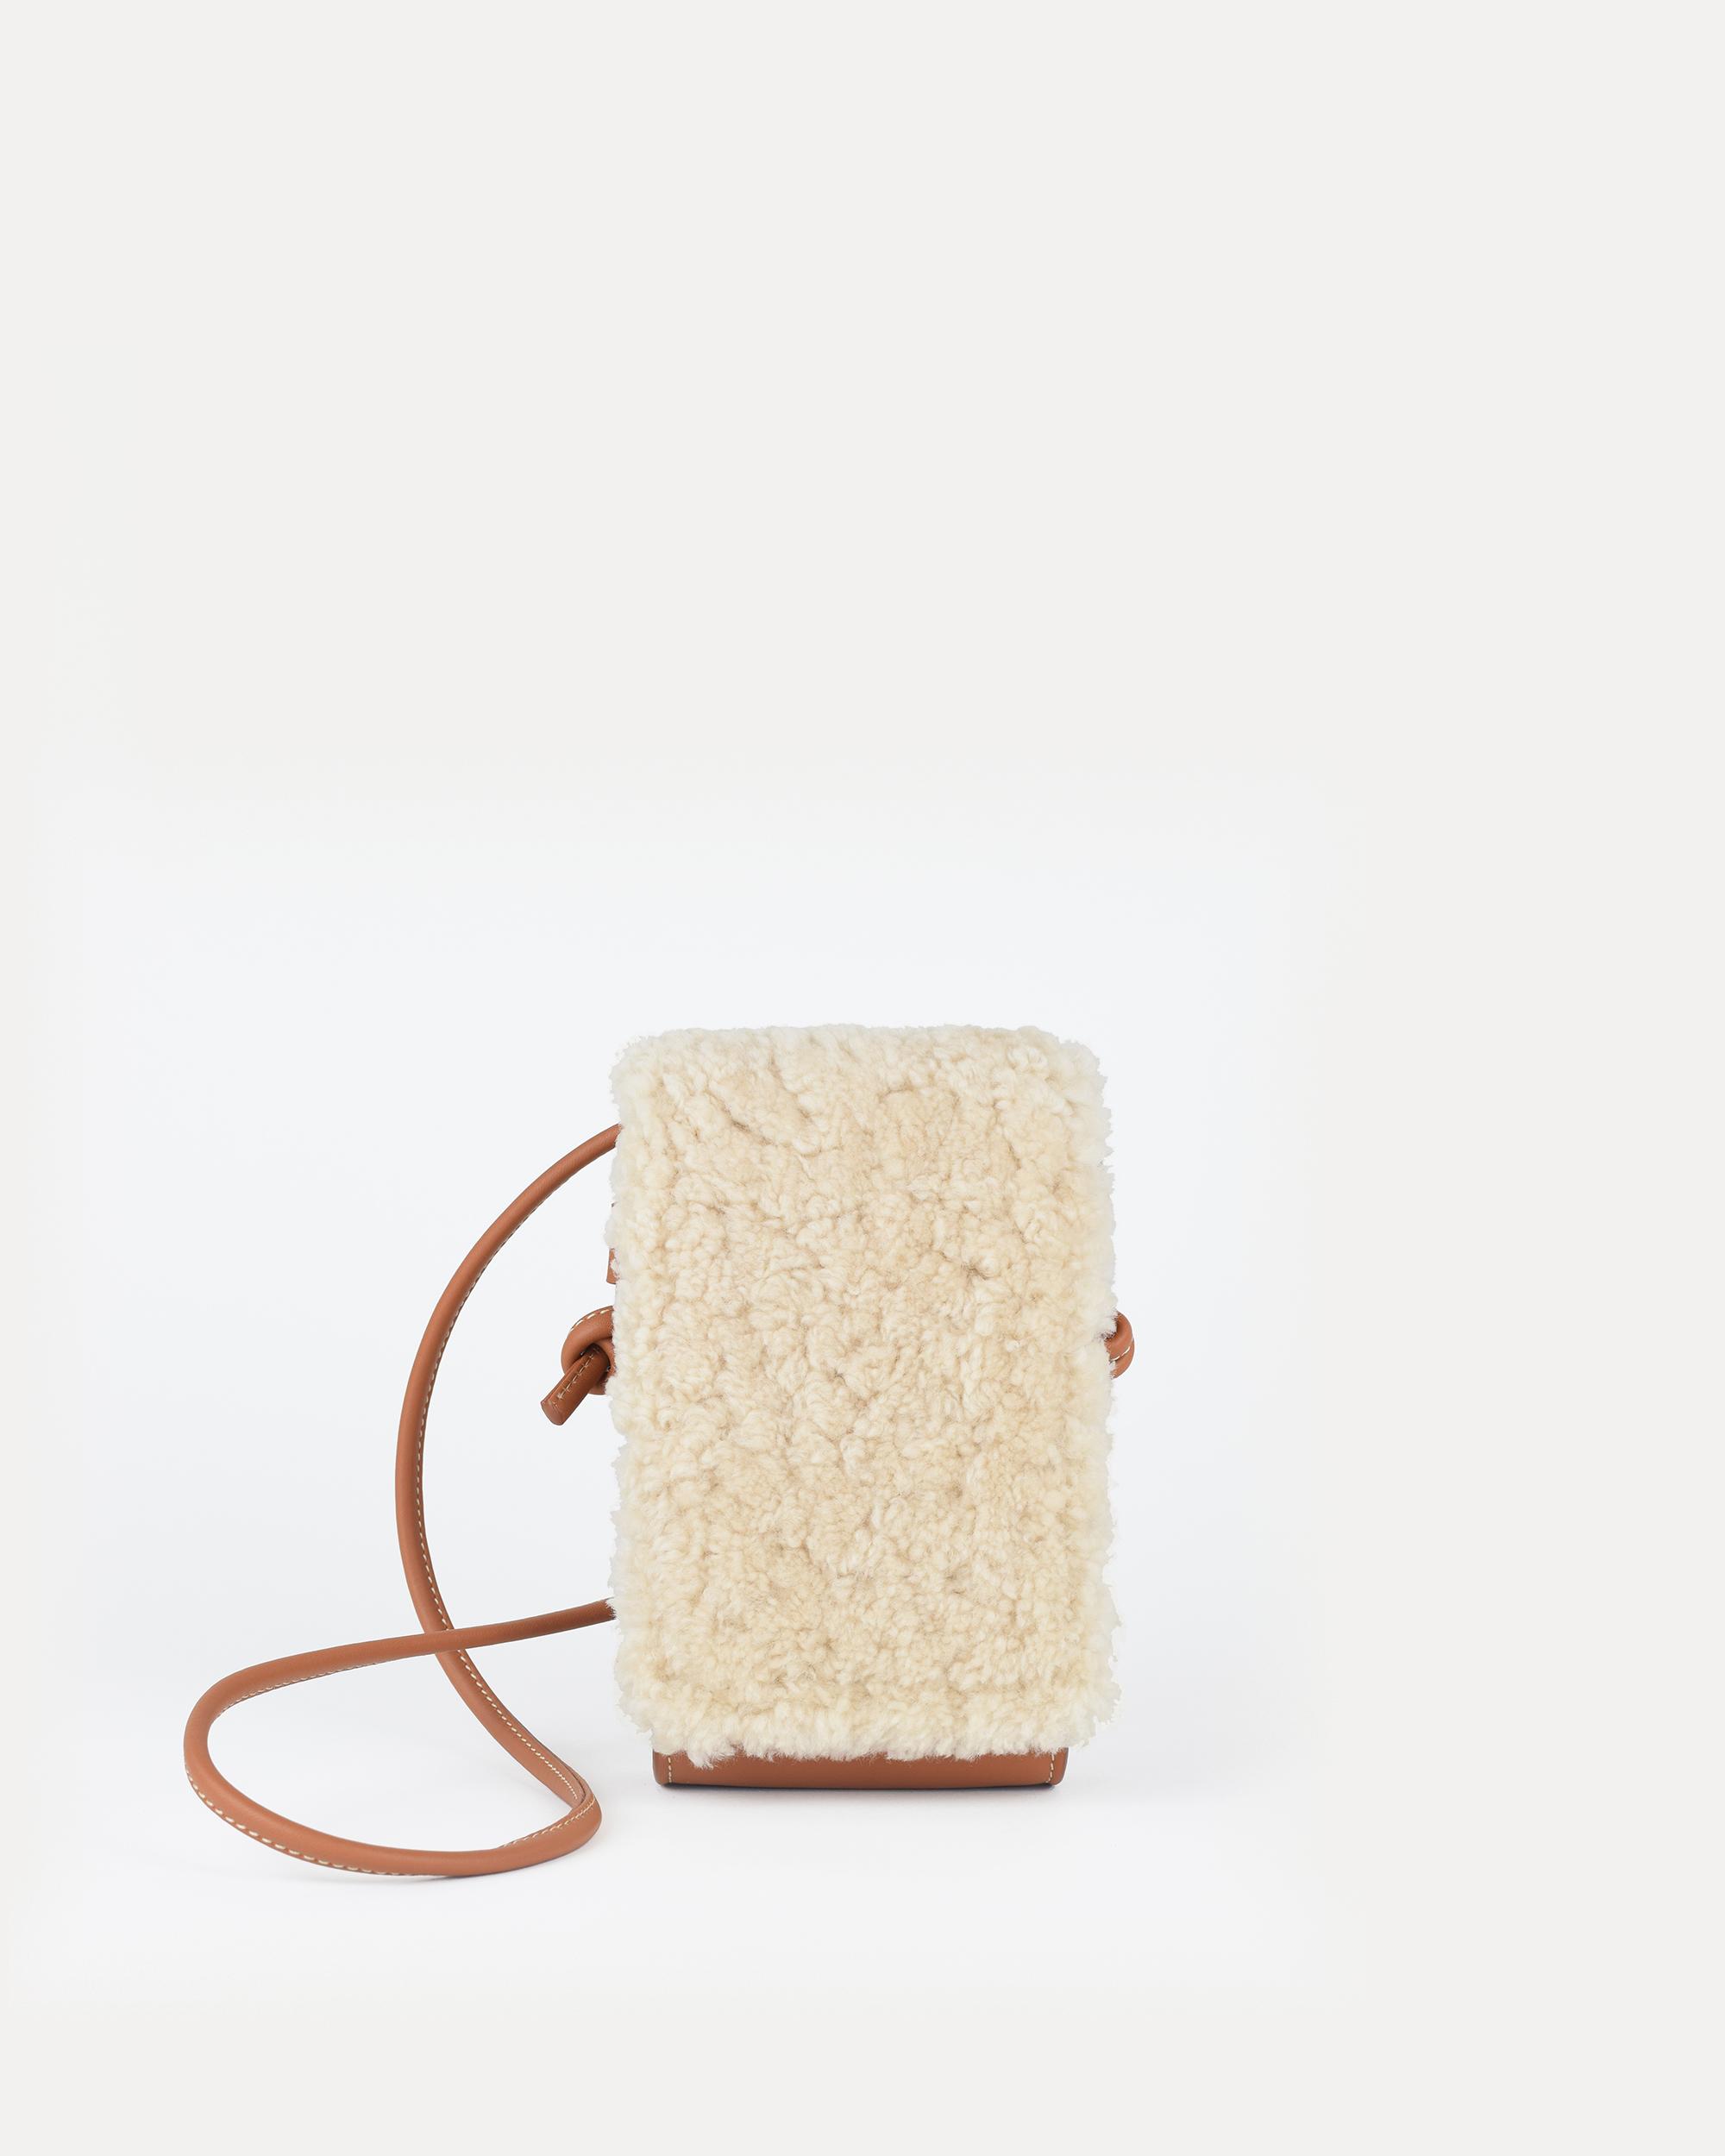 miuur paquito minibag shearling corderito